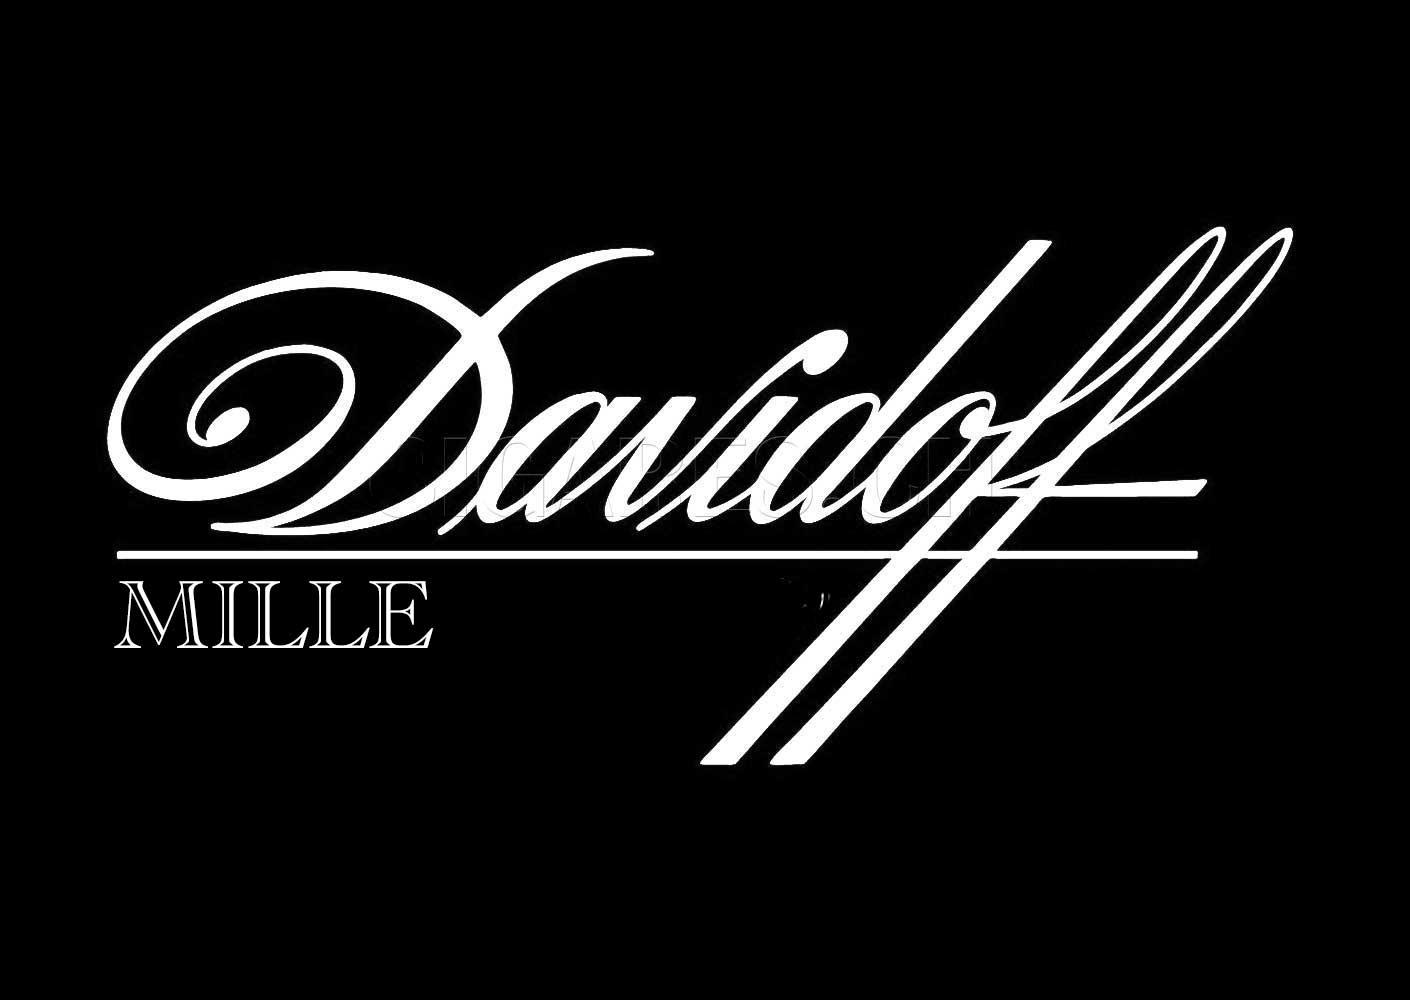 Davidoff Mille logo